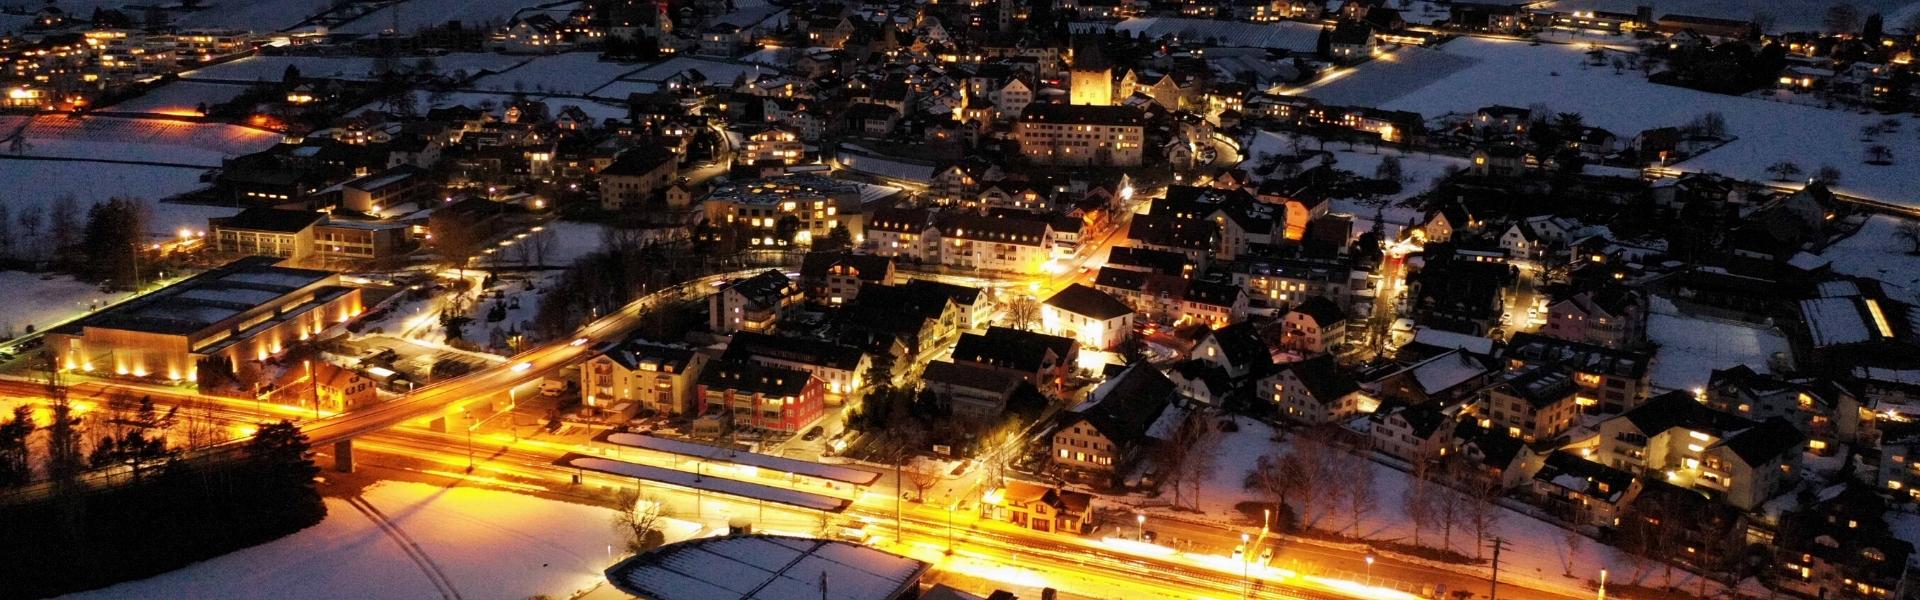 Maienfeld Winter